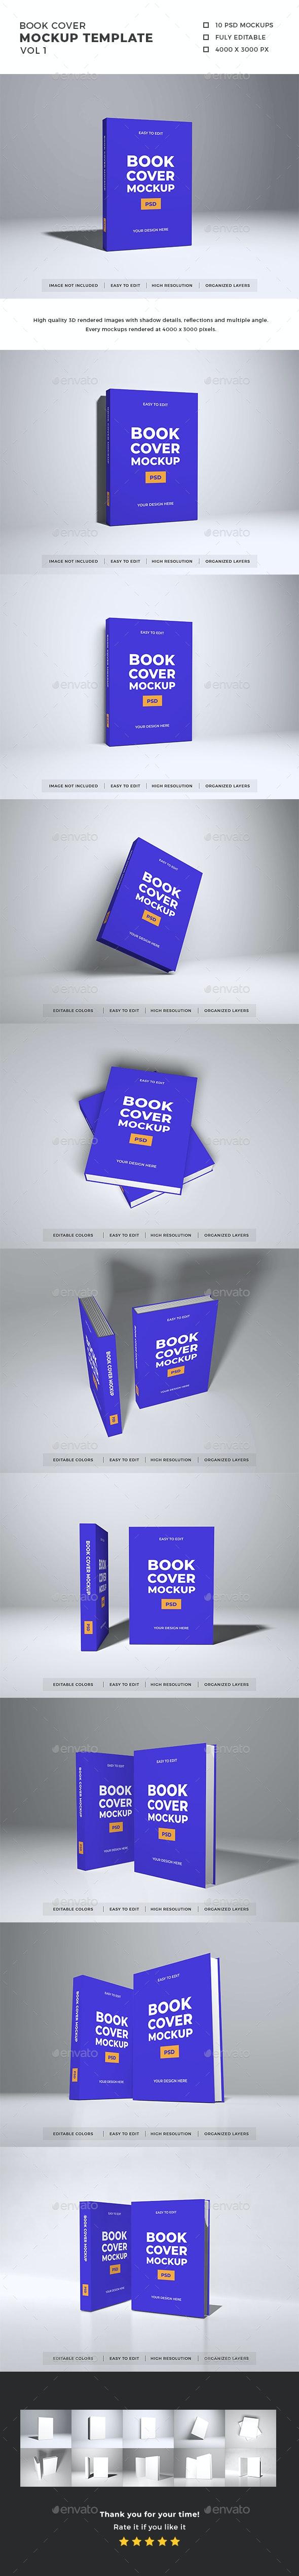 Book Cover Mockup Template Vol 1 - Books Print